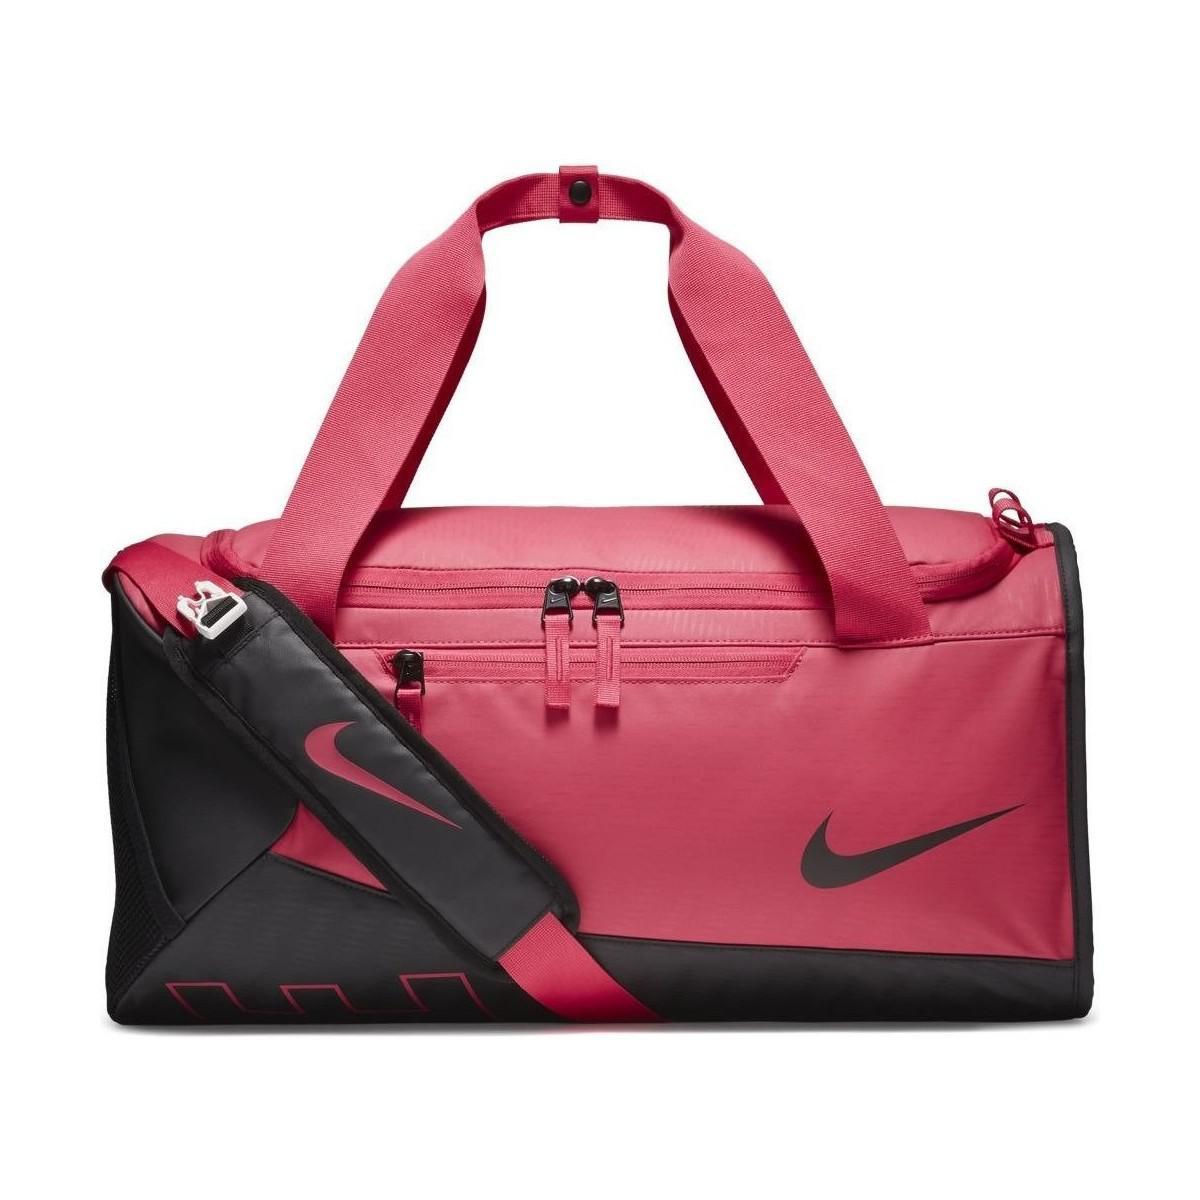 Nike Performance Ba5339 Brasilia - Bolsa De Deporte - Dark Team Red ... 0f8c613f58